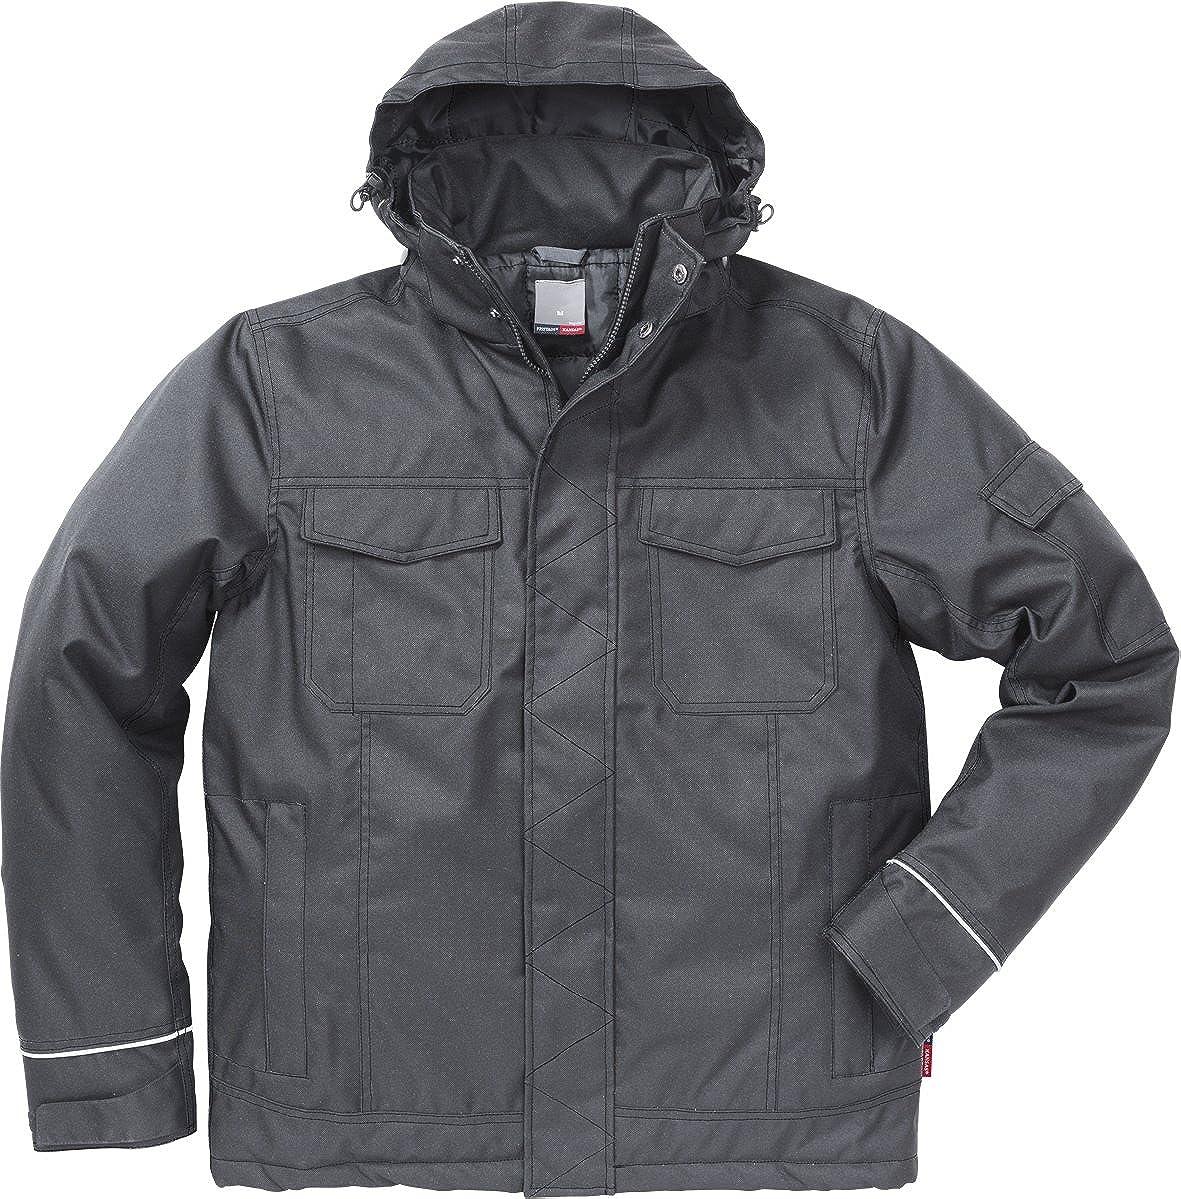 Fristads Kansas Workwear 113080 Winter Jacket